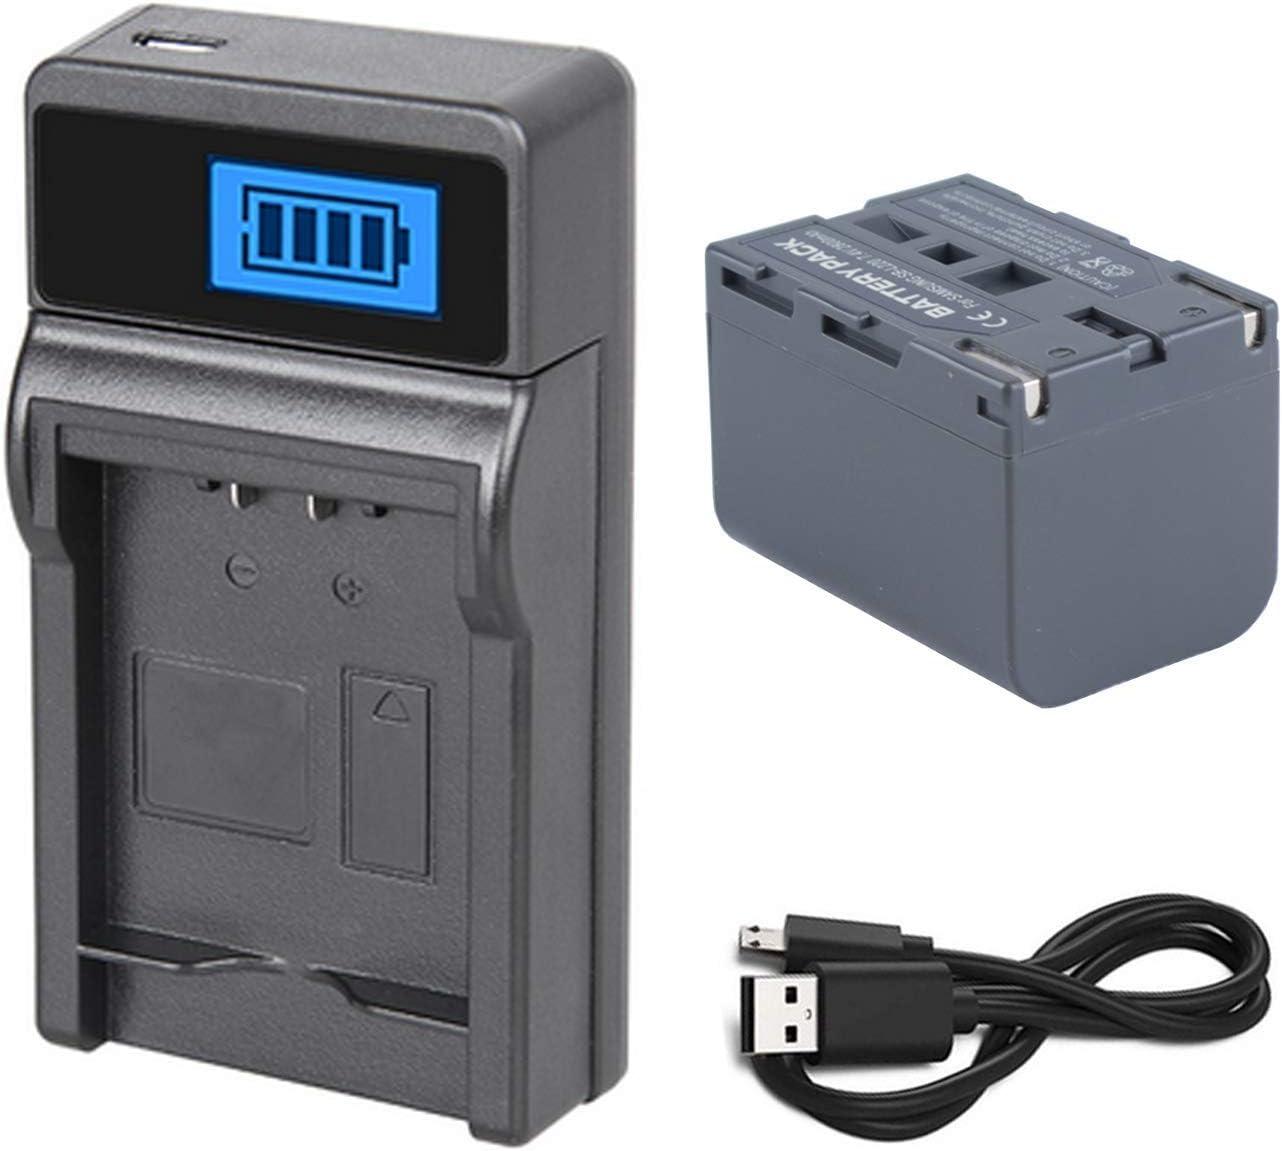 SC-D307 Digital Video Camcorder Charger for Samsung SC-D80 SC-D86 SC-D305 Battery Pack SC-D87 SC-D303